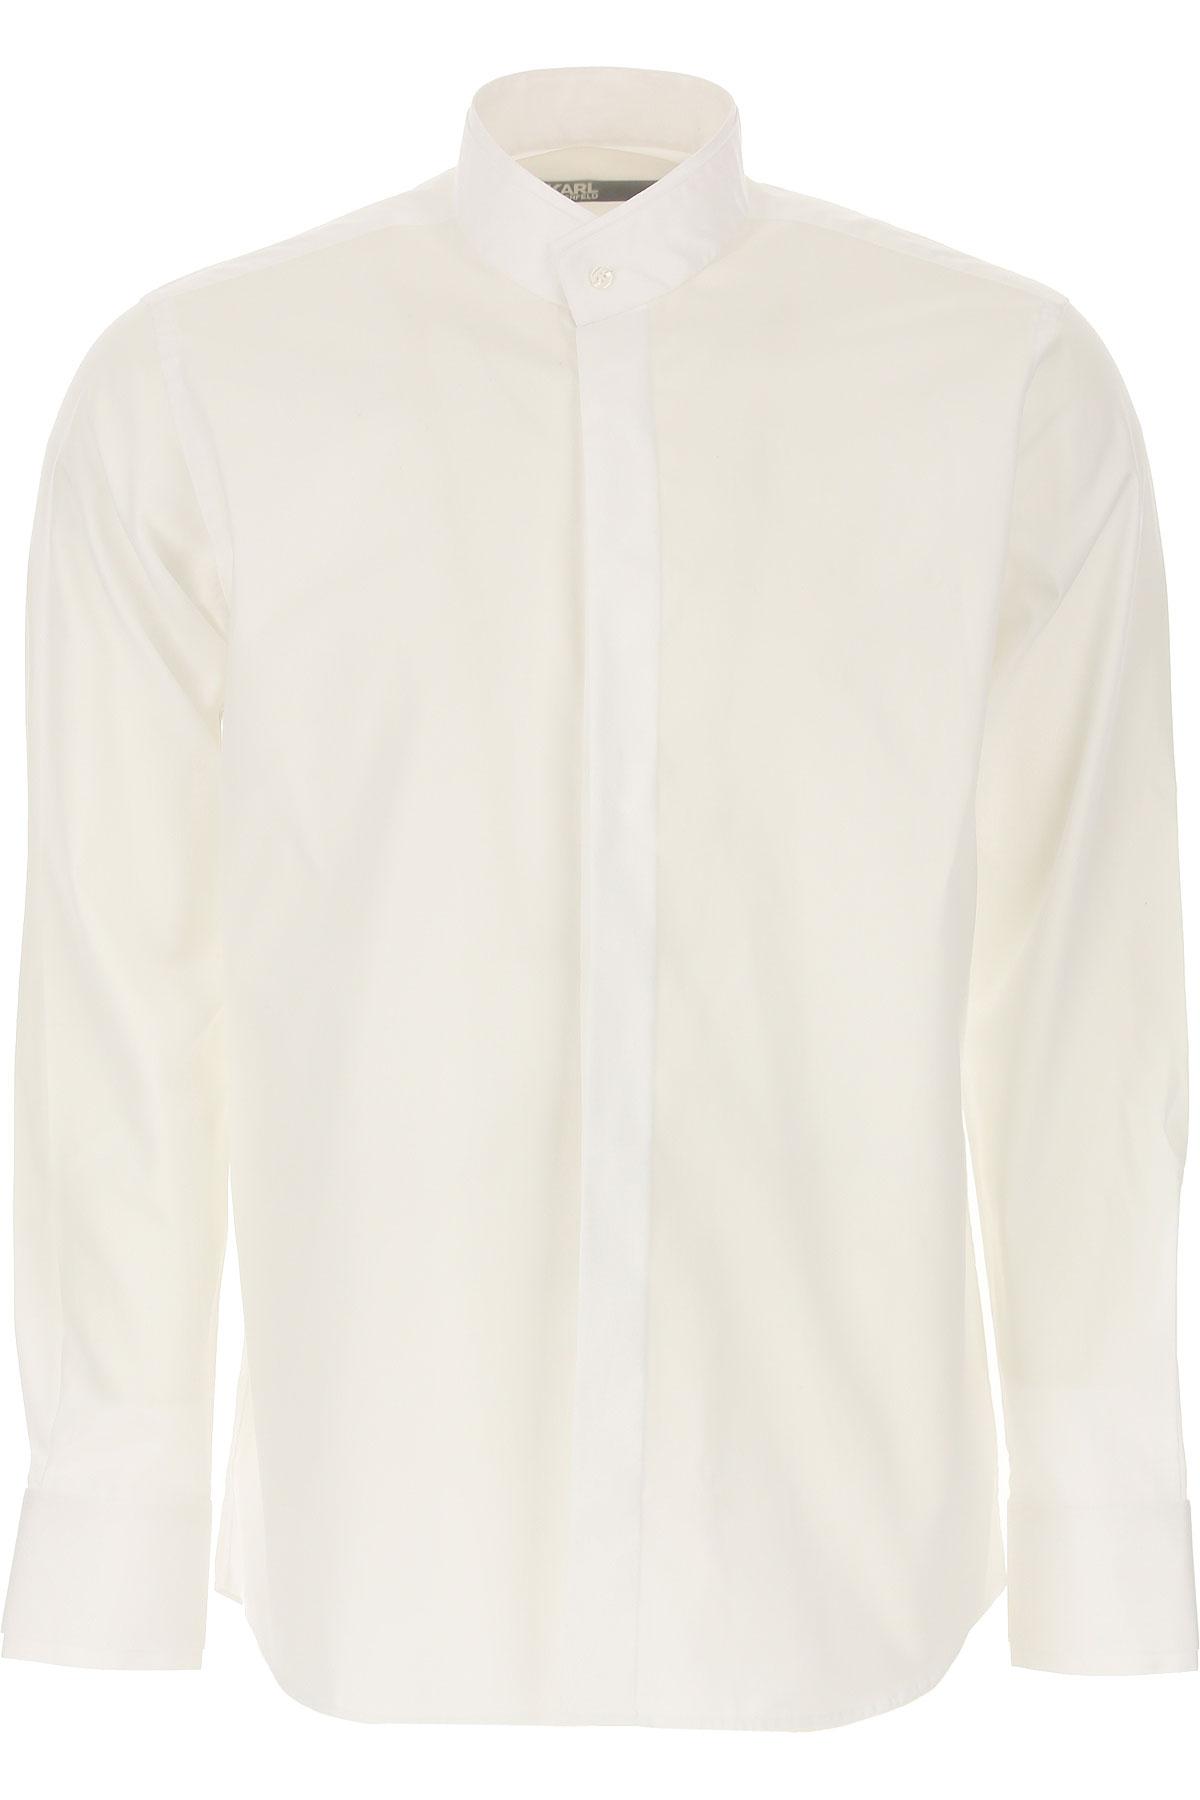 Karl Lagerfeld Chemise Homme, Blanc, Coton, 2019, M S XL